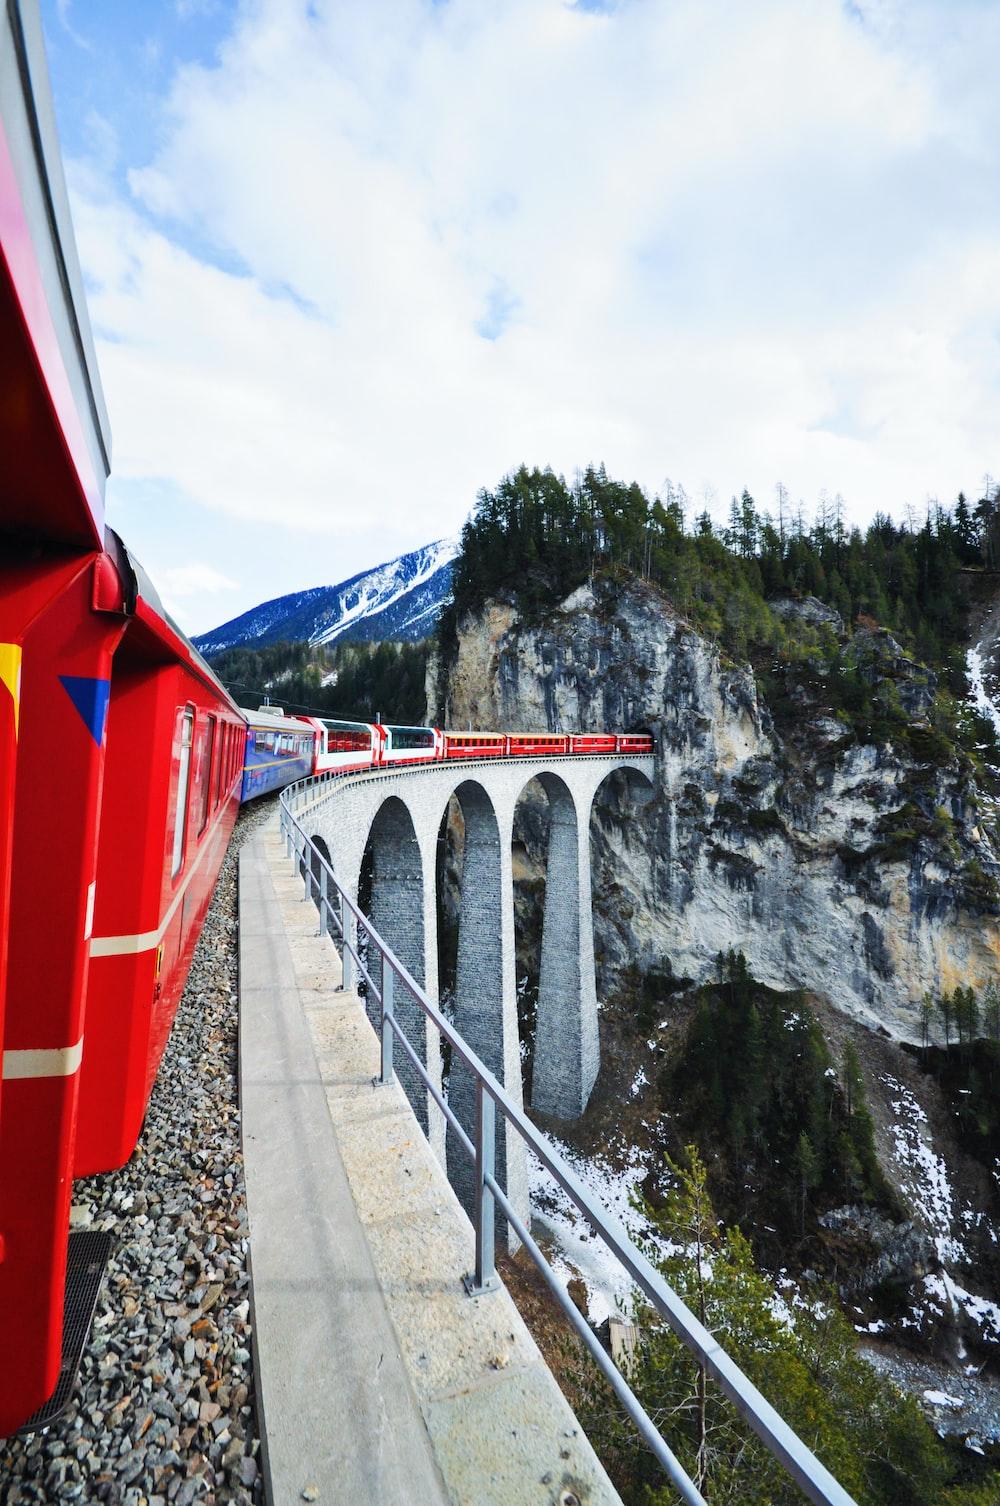 scenery of mountain and bridge